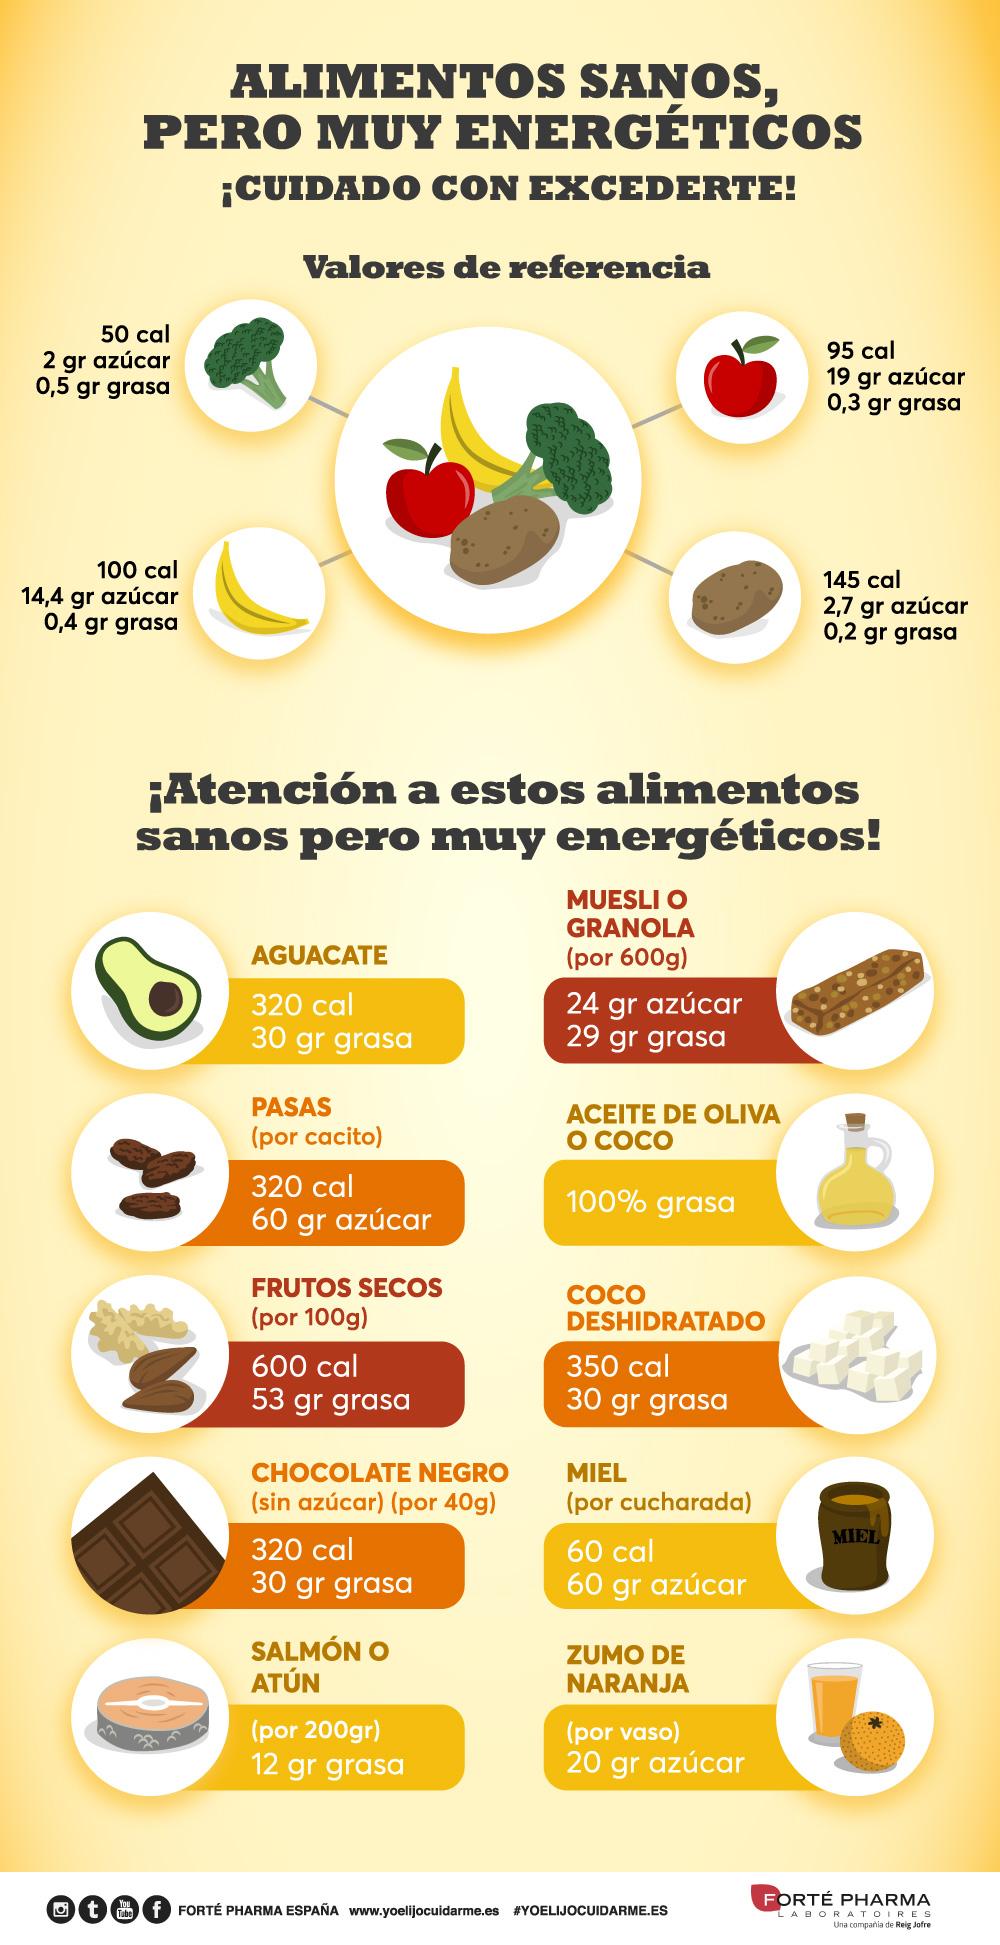 Que alimentos contienen mas calorias para engordar